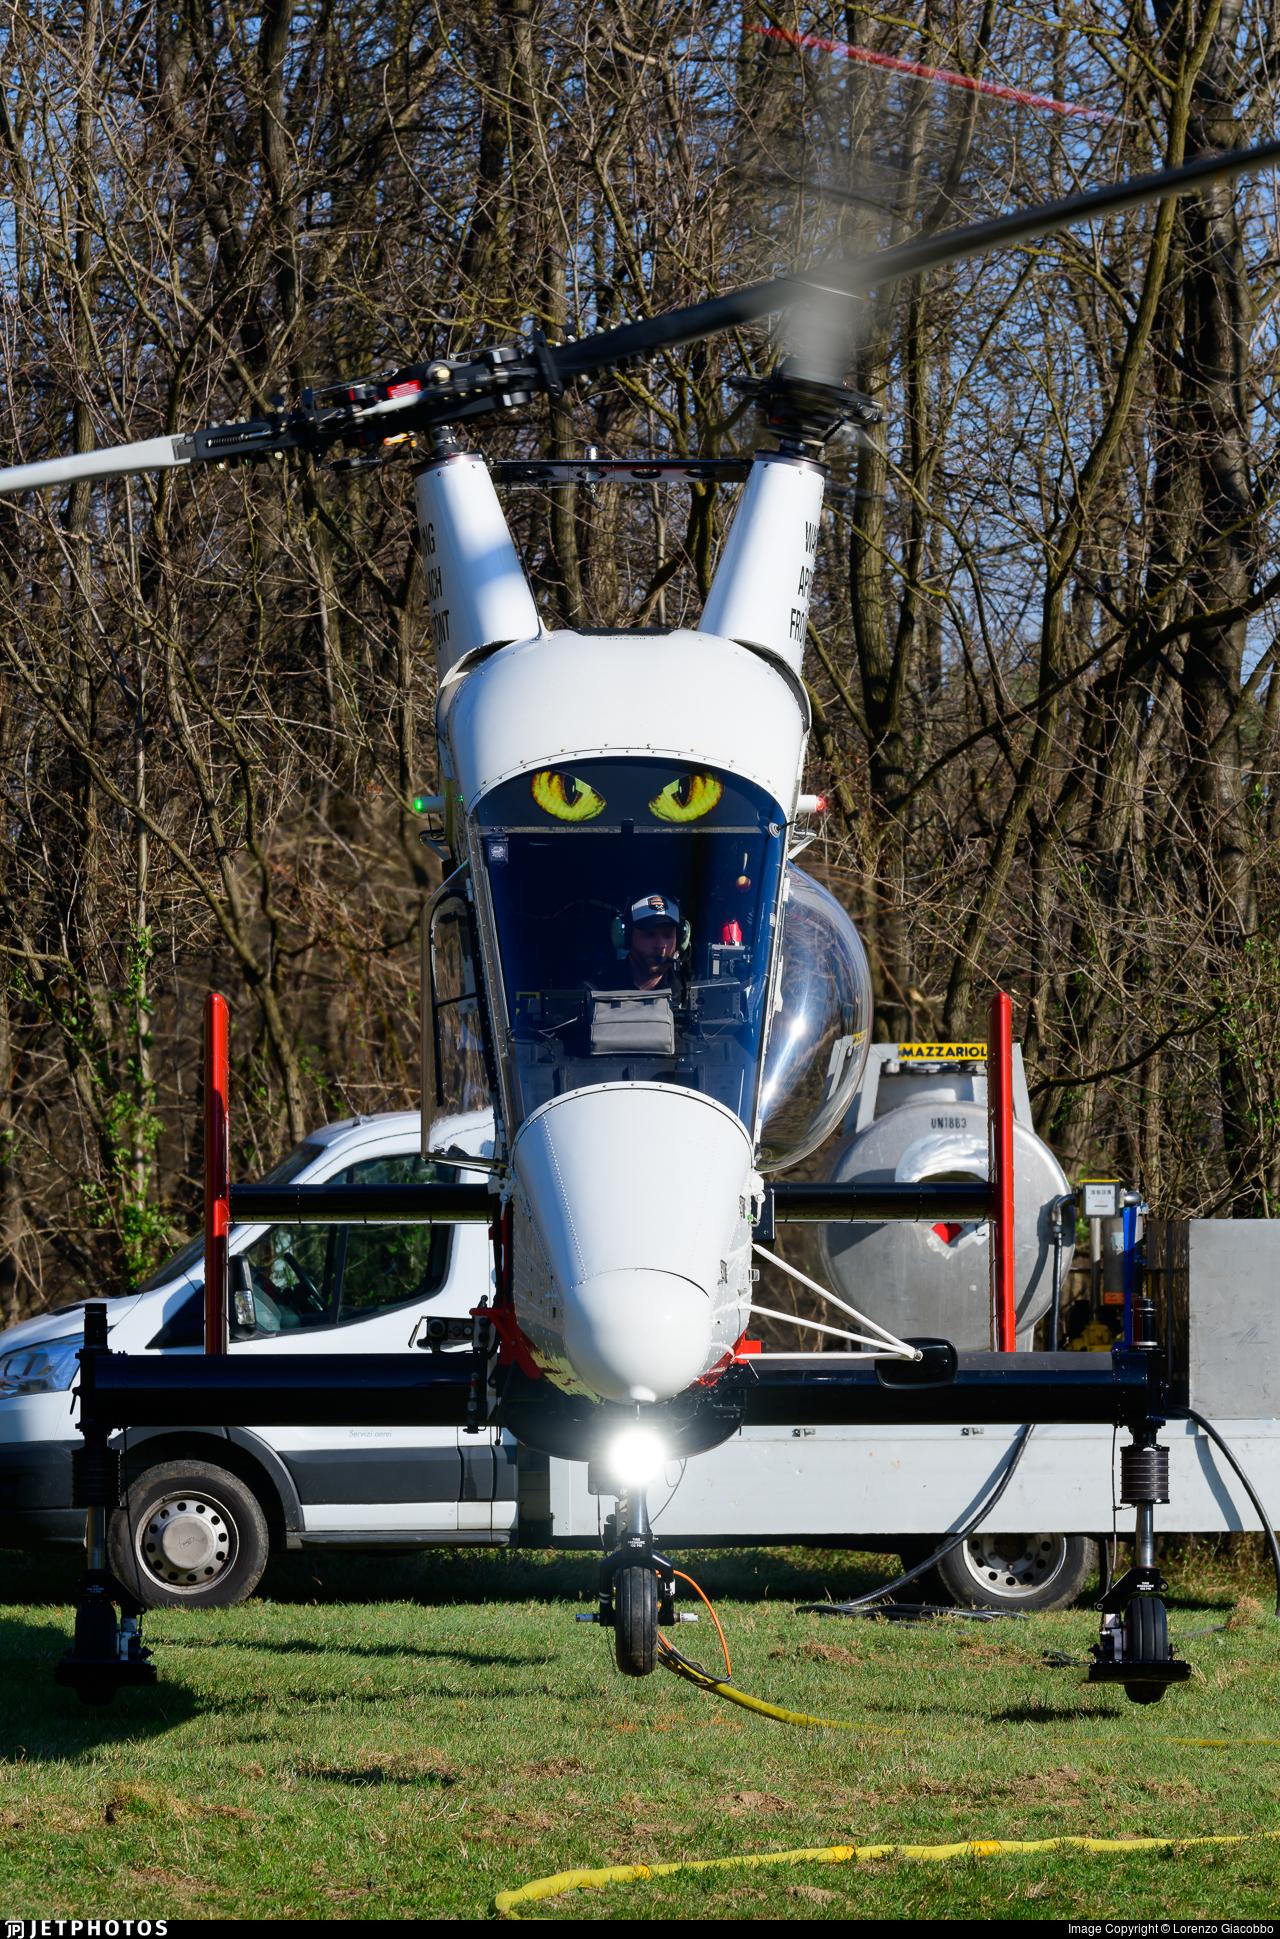 HB-ZGK - Kaman K-1200 K-Max - Rotex Helicopter